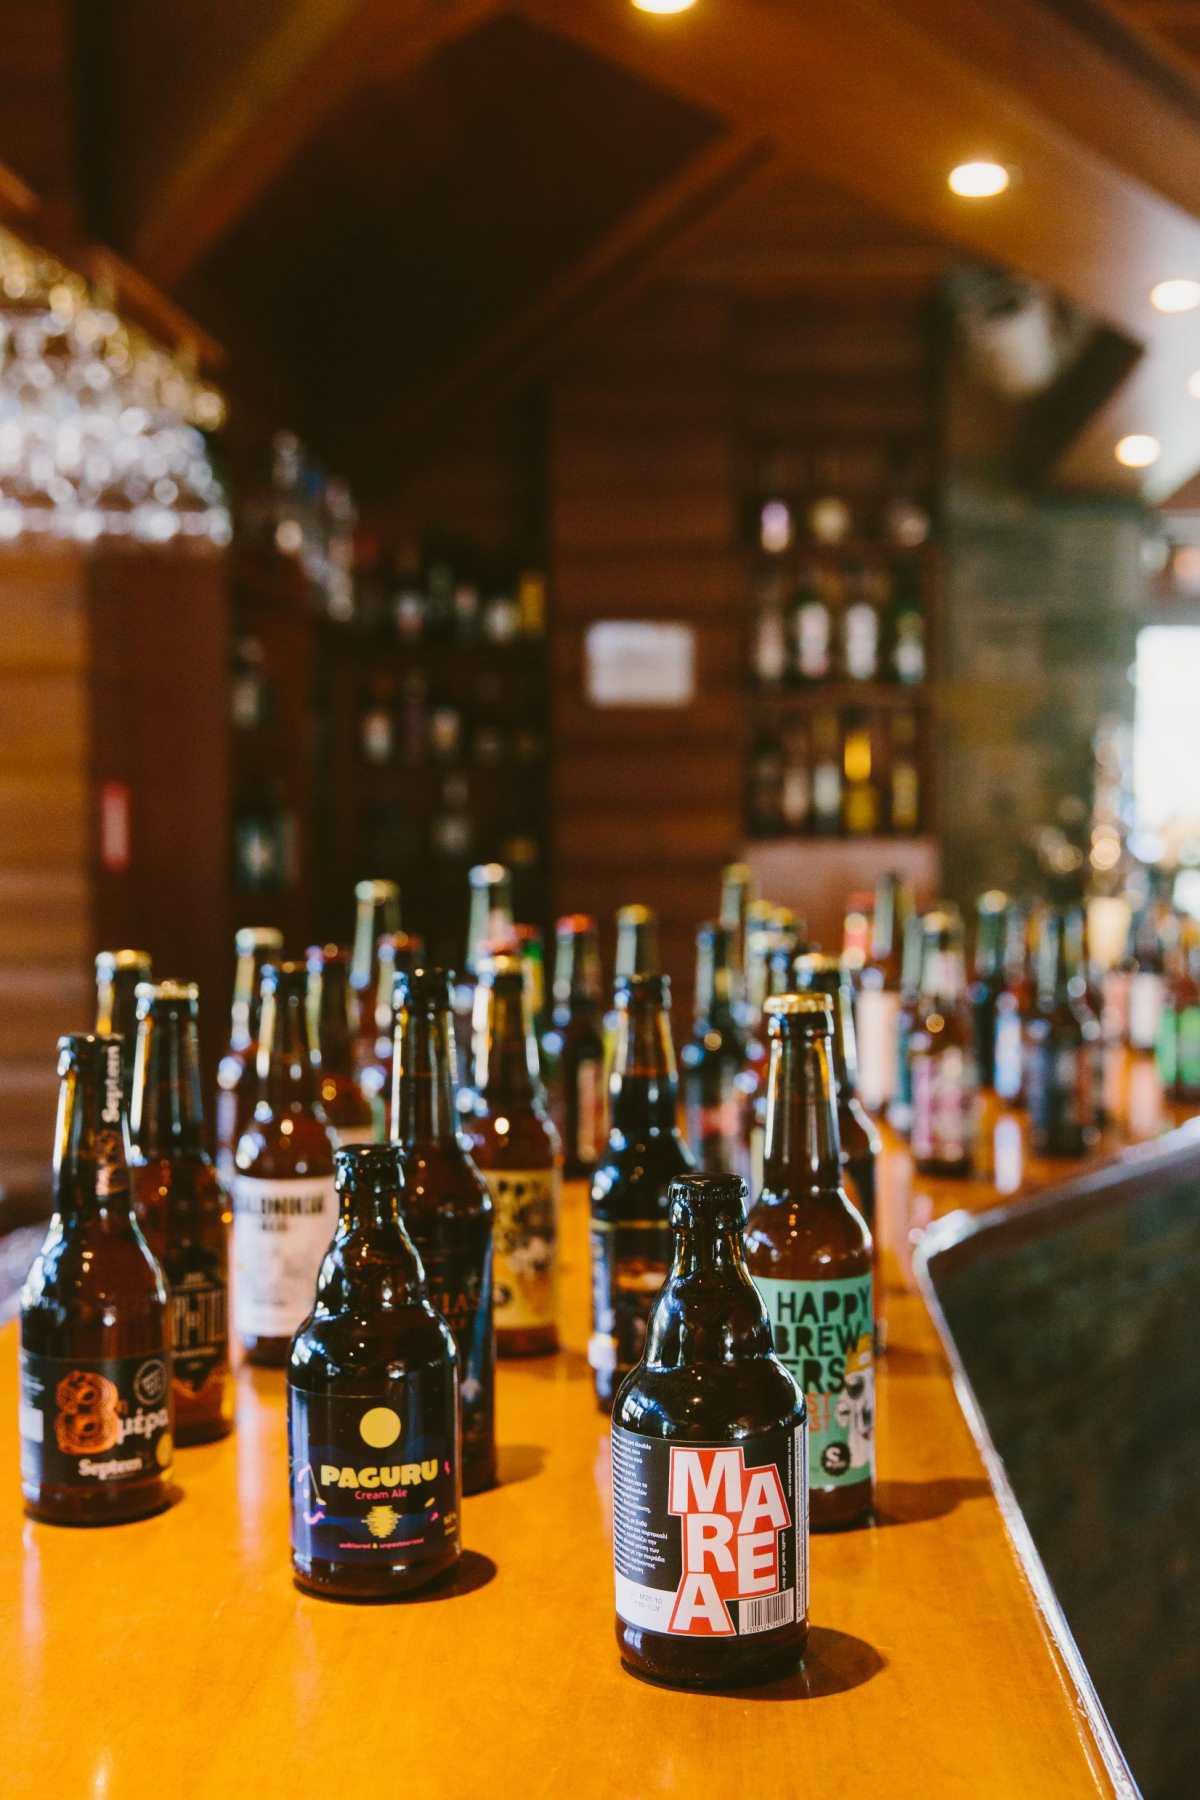 Elatos Resort: 6ο Ελληνικό Oktoberfest, τοπικά εδέσματα με συνοδεία από αρωματικές μπίρες με προέλευση από ελληνικές μικροζυθοποιίες